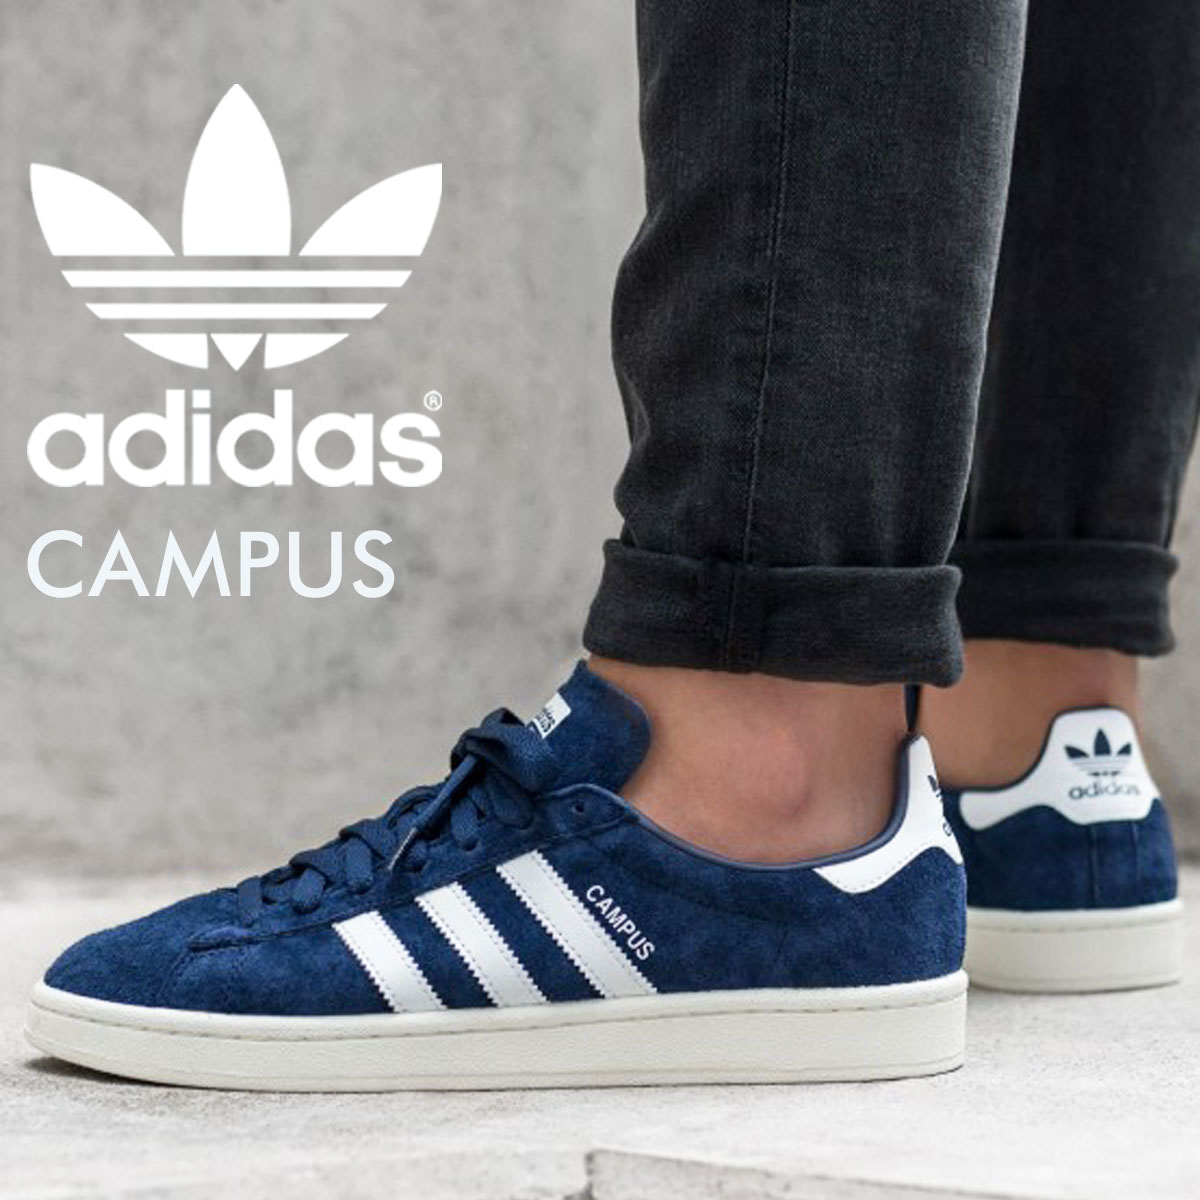 purchase cheap d57f7 34f49 Adidas campus adidas originals sneakers CAMPUS men gap Dis BZ0086 shoes  blue  9 13 Shinnyu load